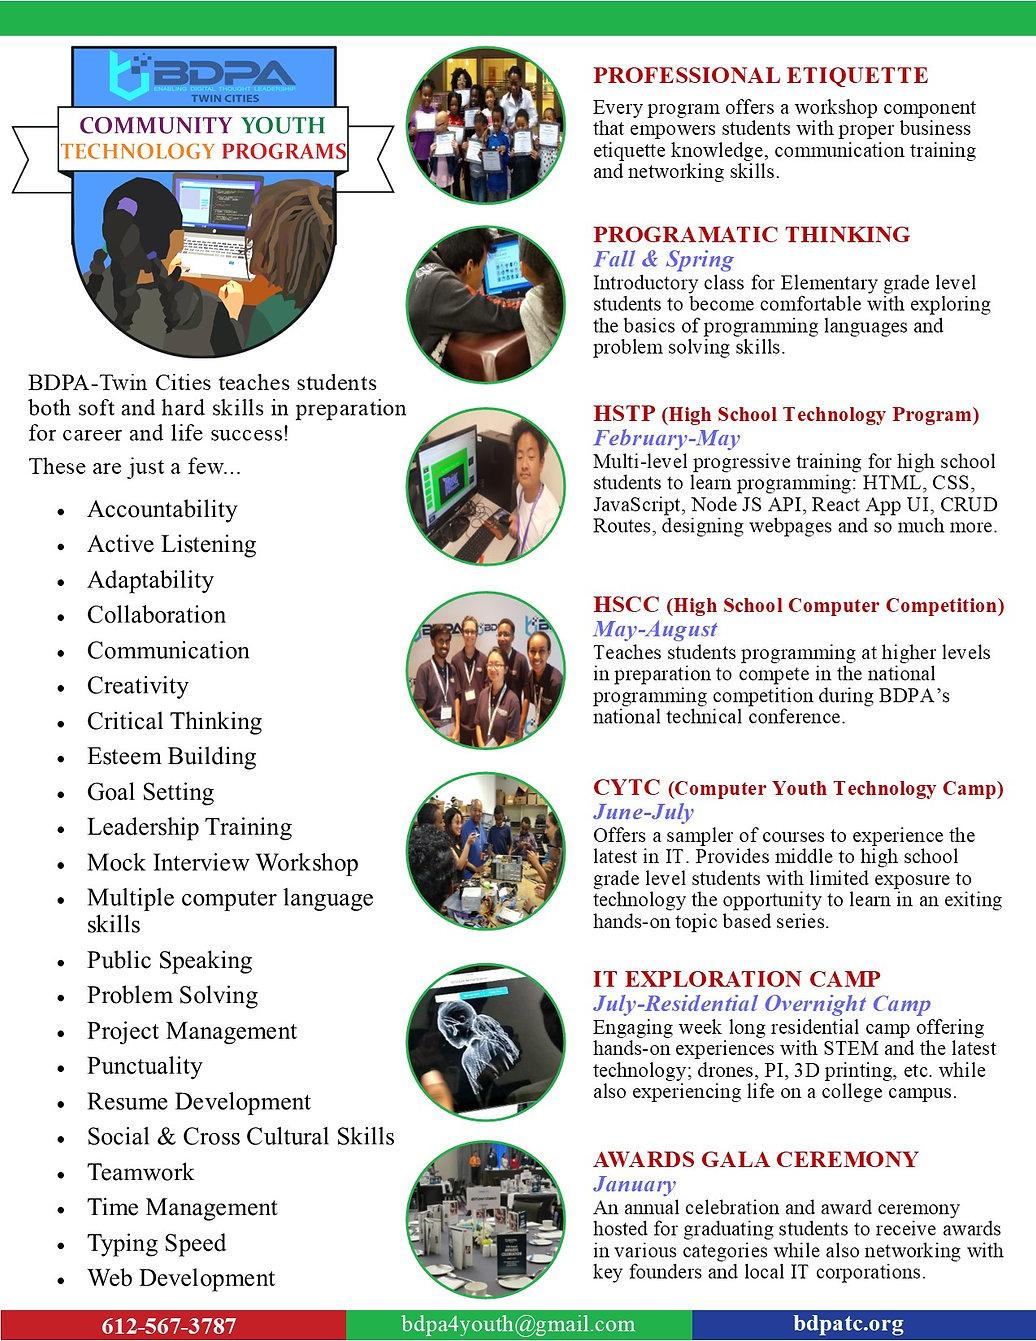 BDPATC Programs Overview 2021back.jpg